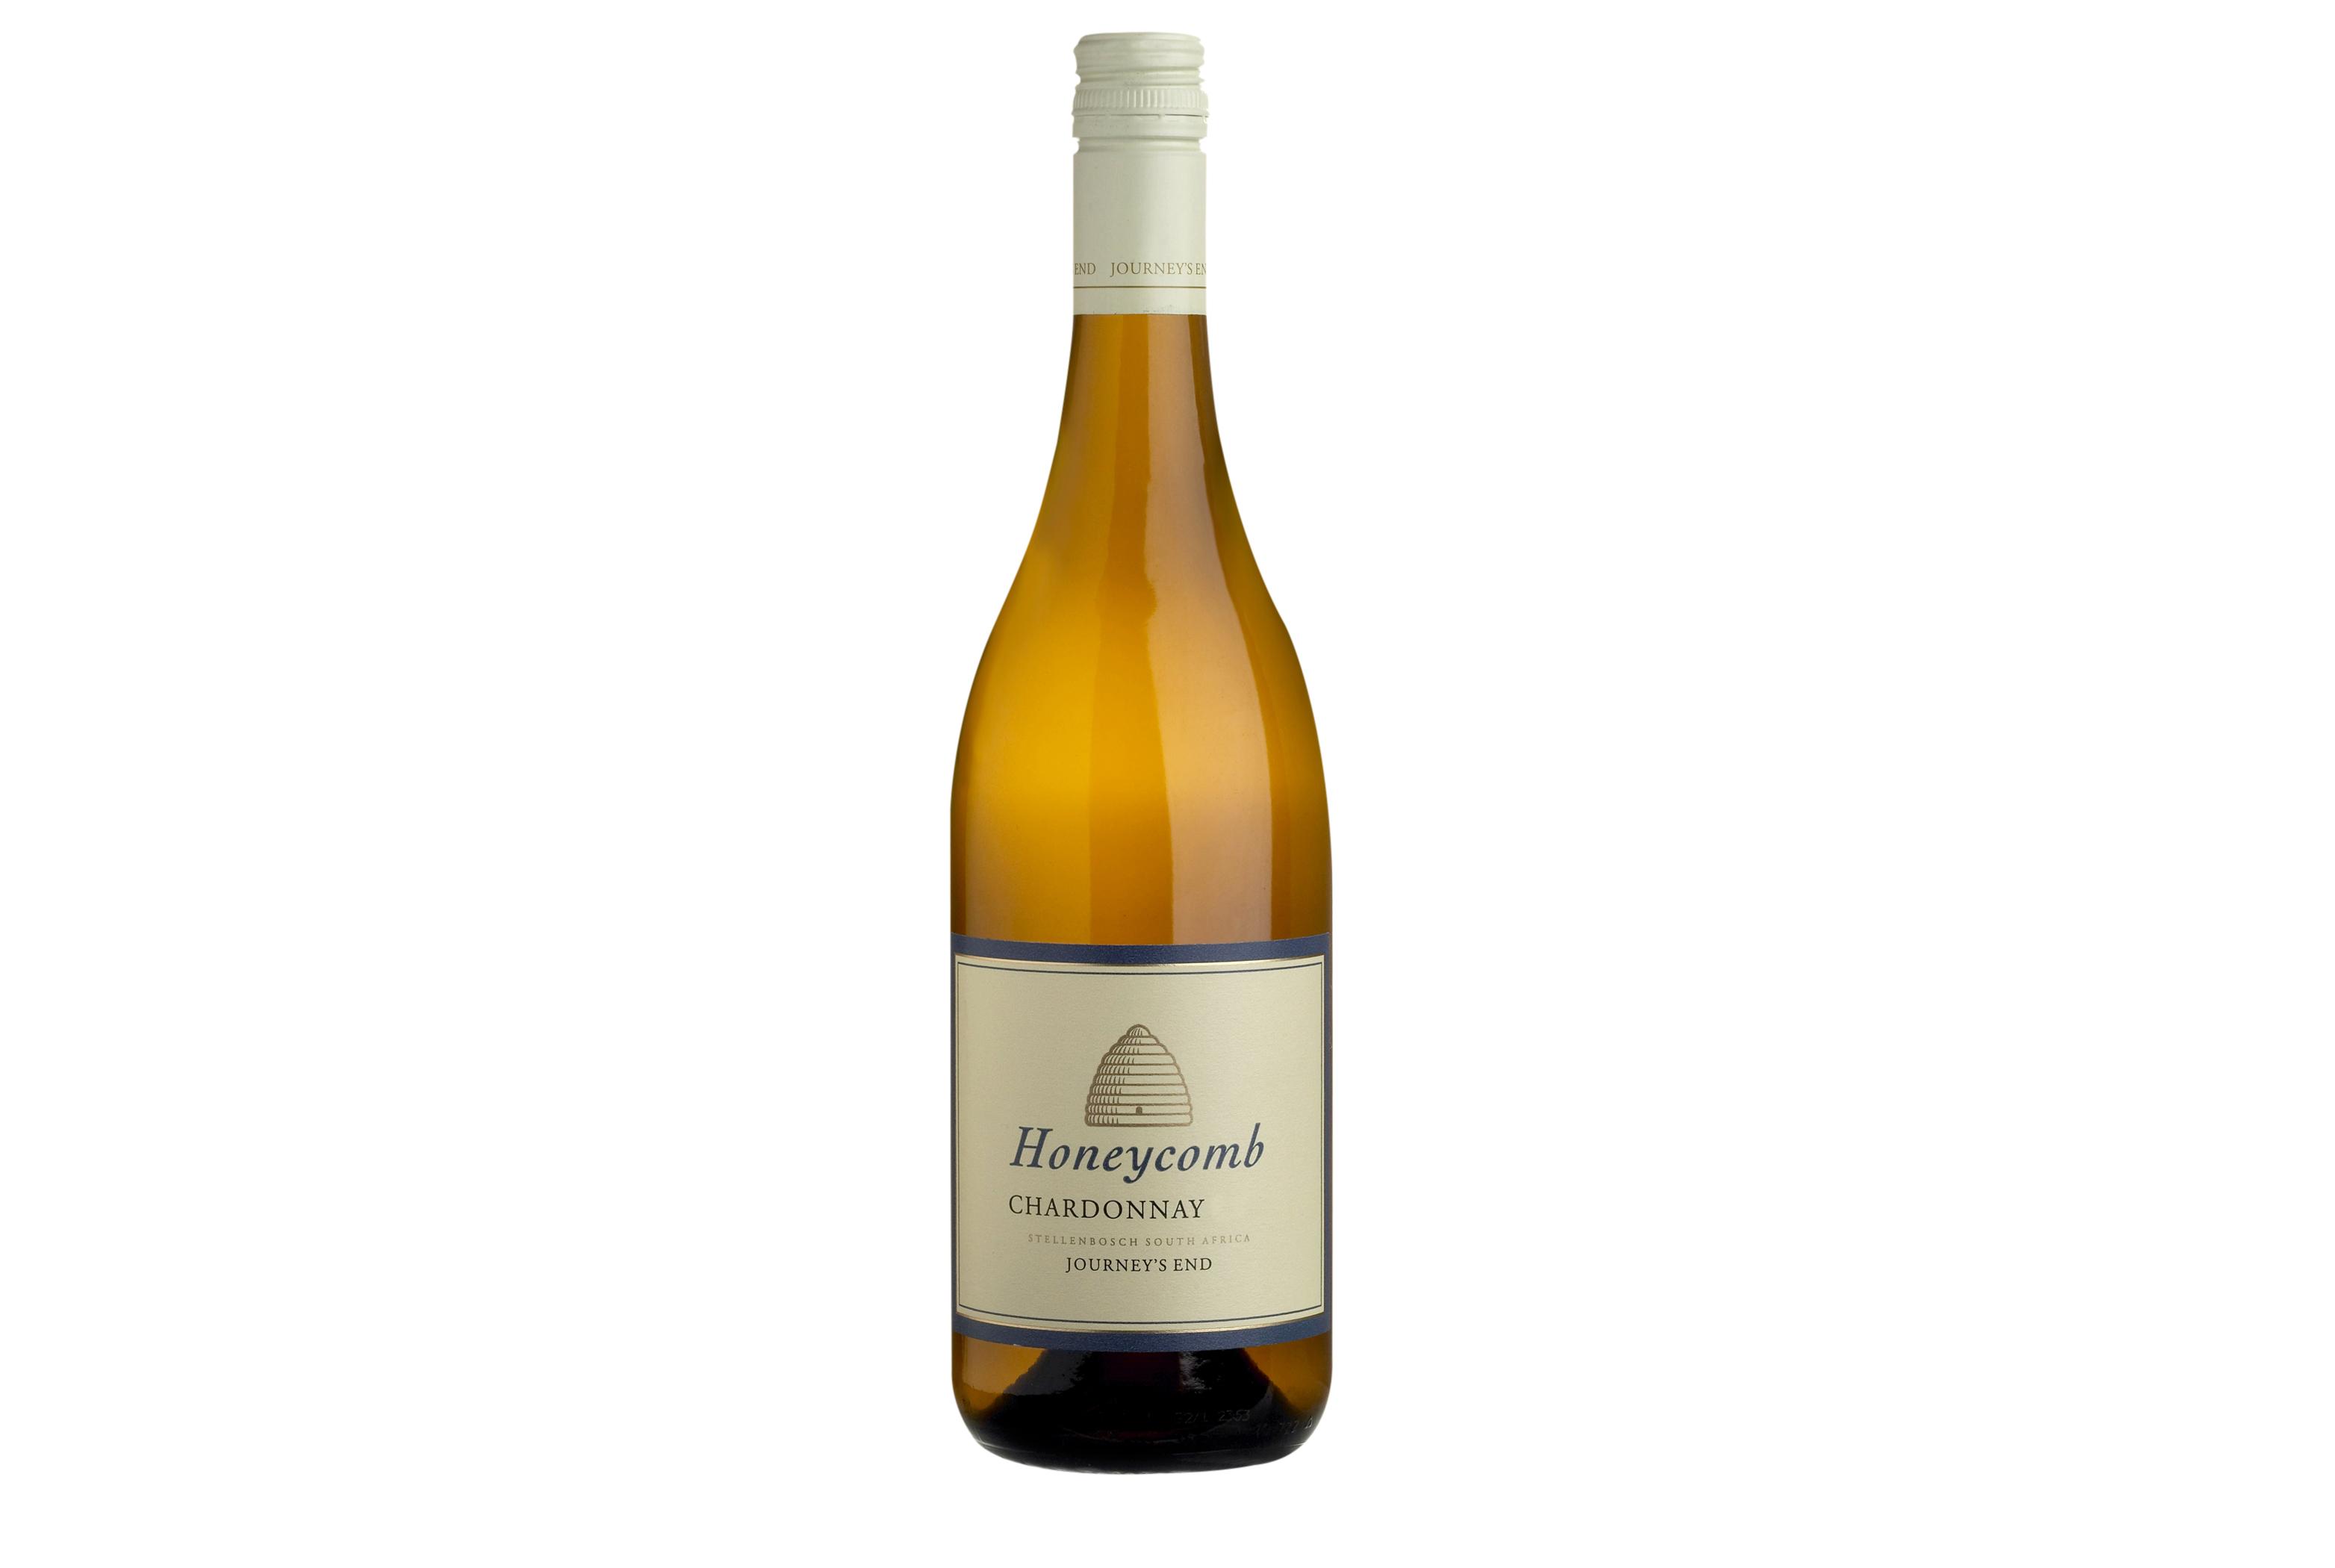 Honeycomb wine bottle